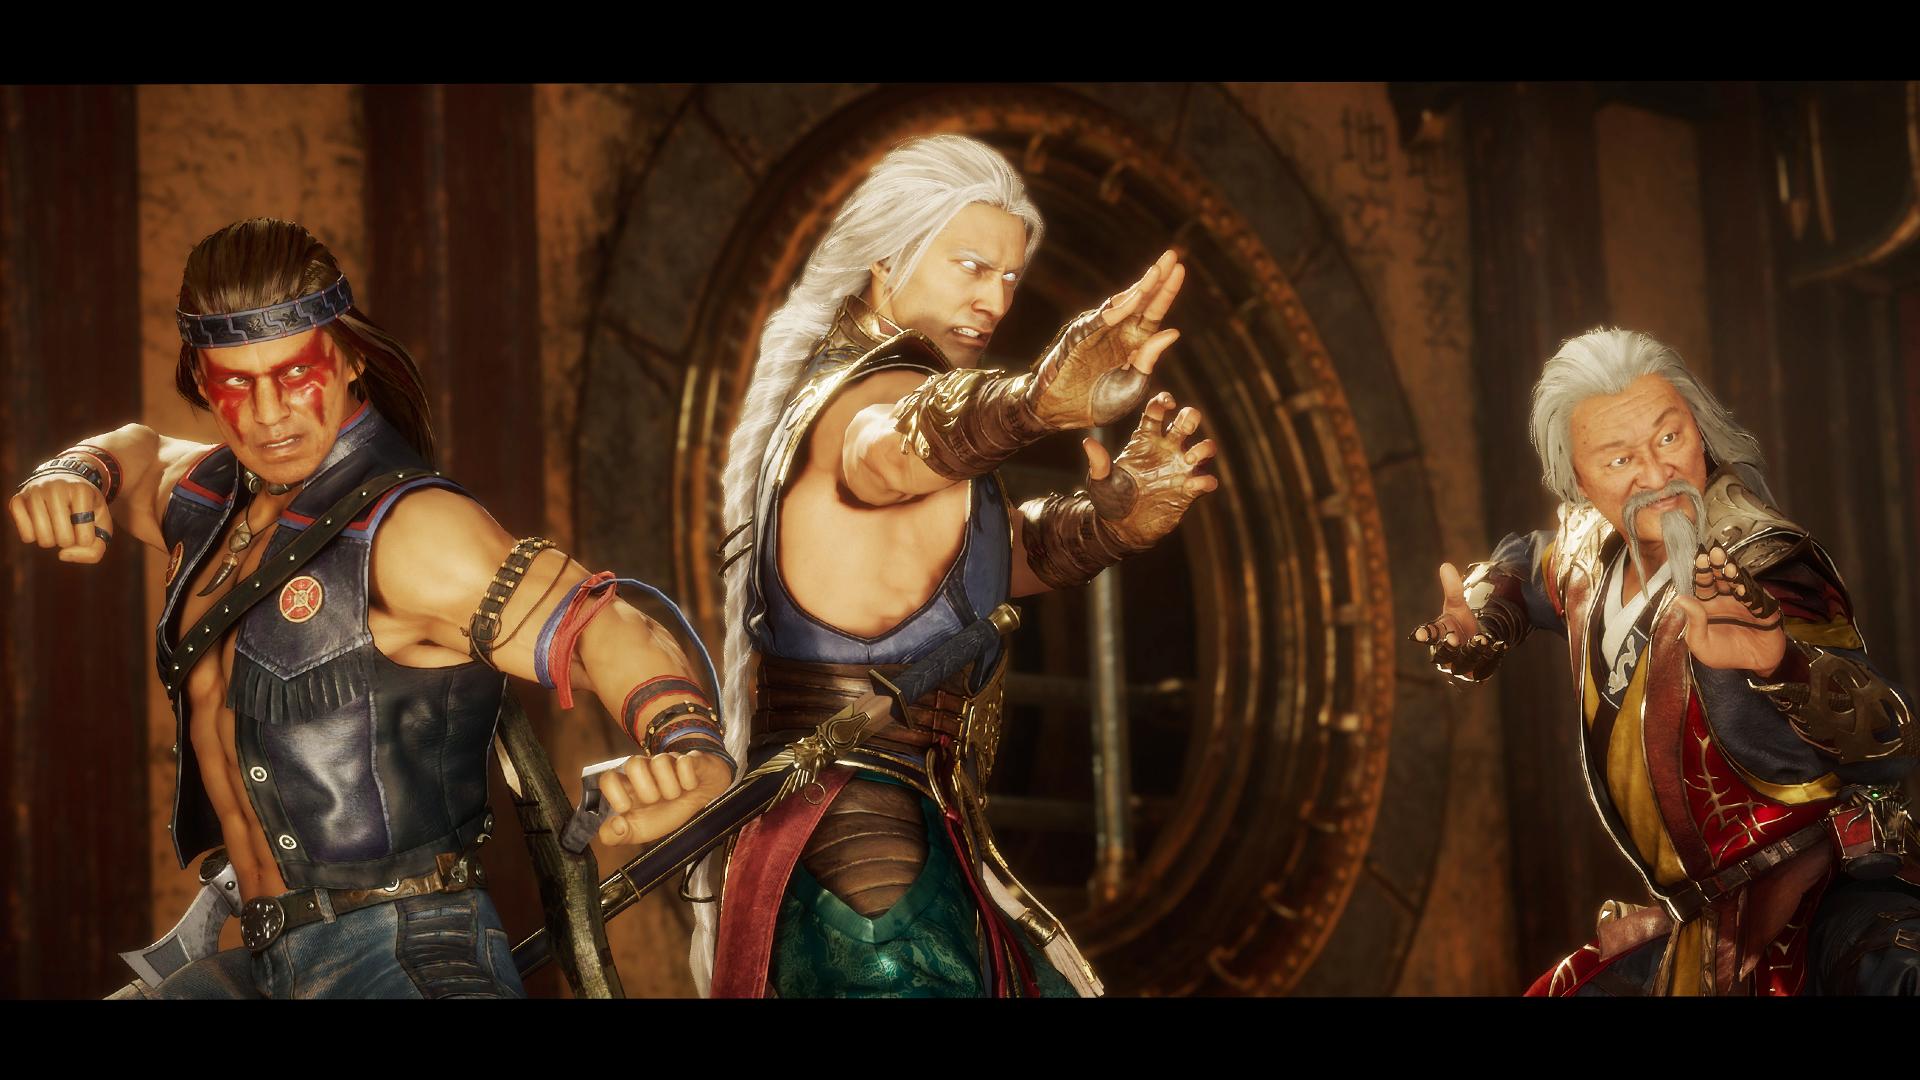 Mortal Kombat 11: Aftermath impressions